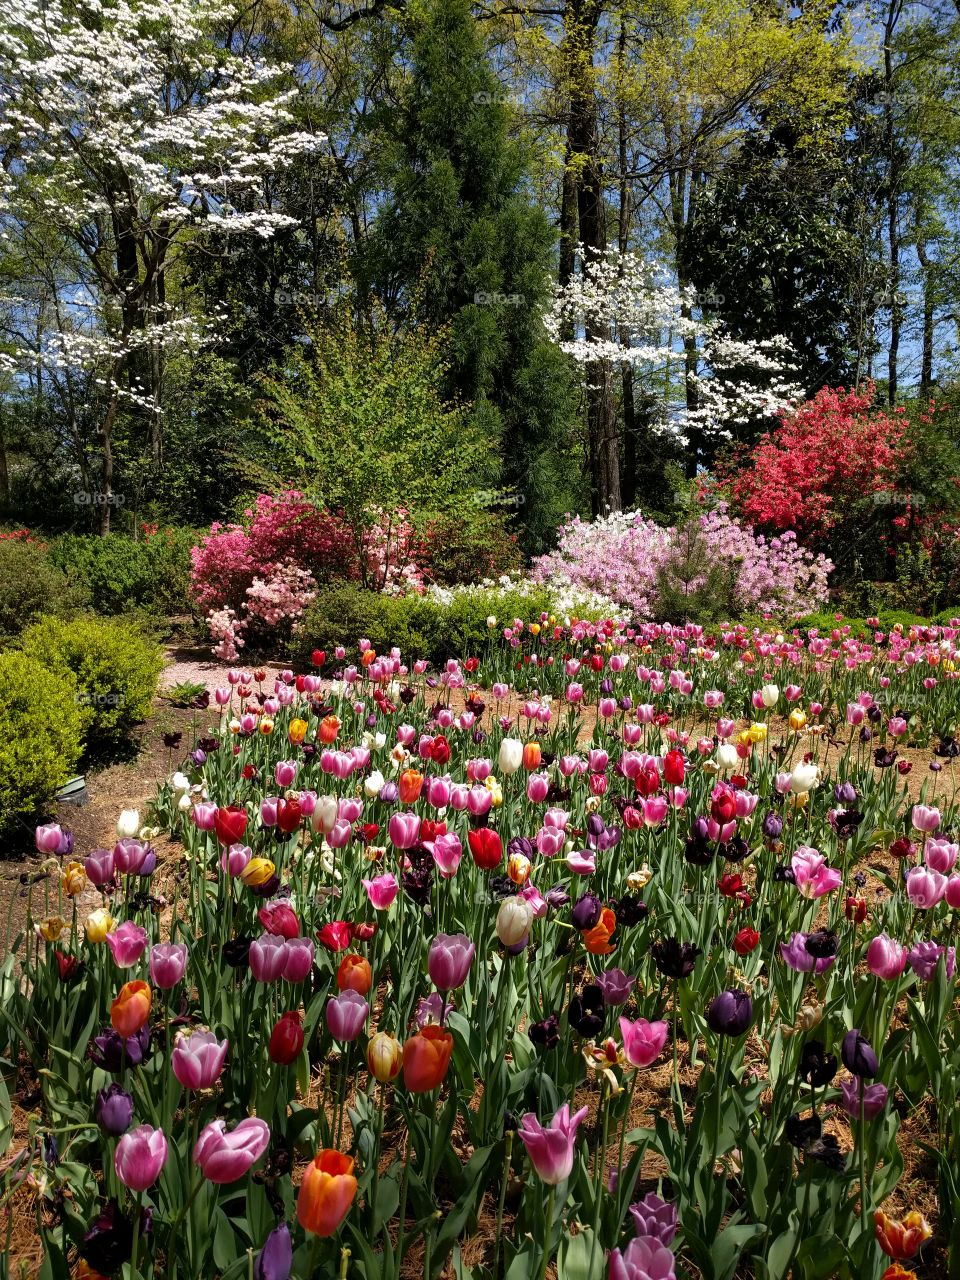 paths through the tulips with azaleas behind them, Dixon gardens, Memphis, TN, spring 2016